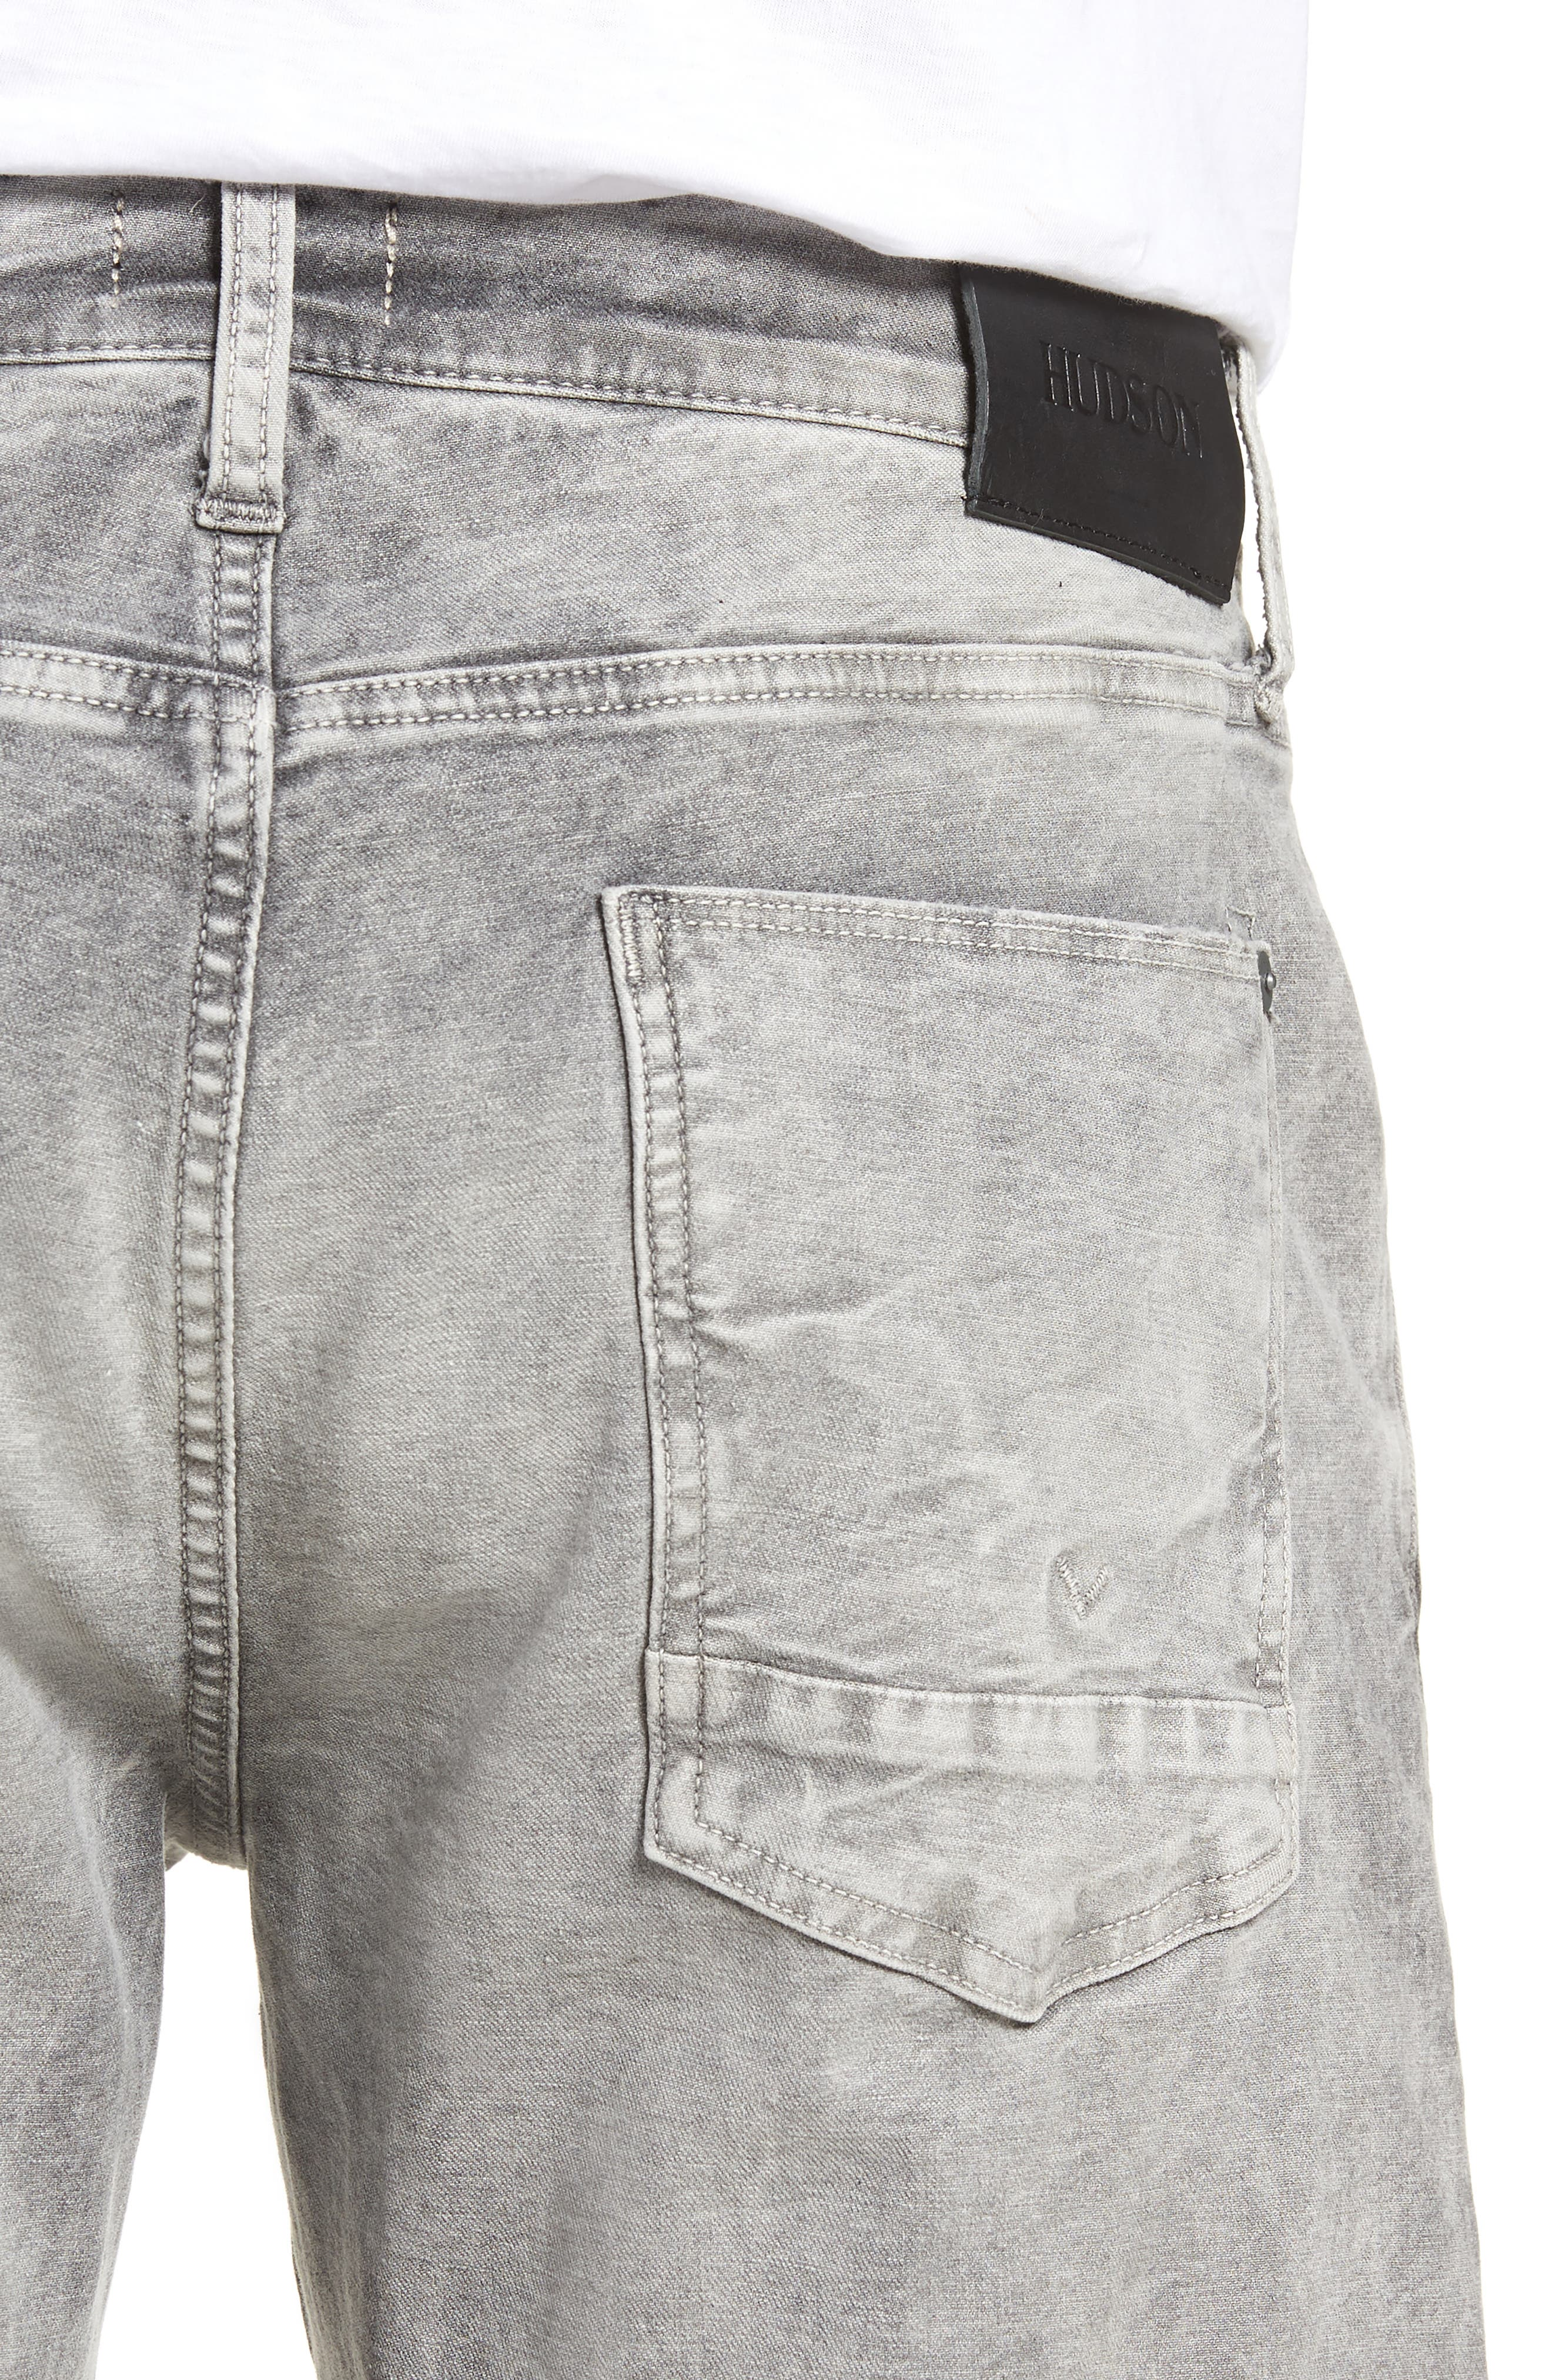 Blake Slim Fit Jeans,                             Alternate thumbnail 4, color,                             063